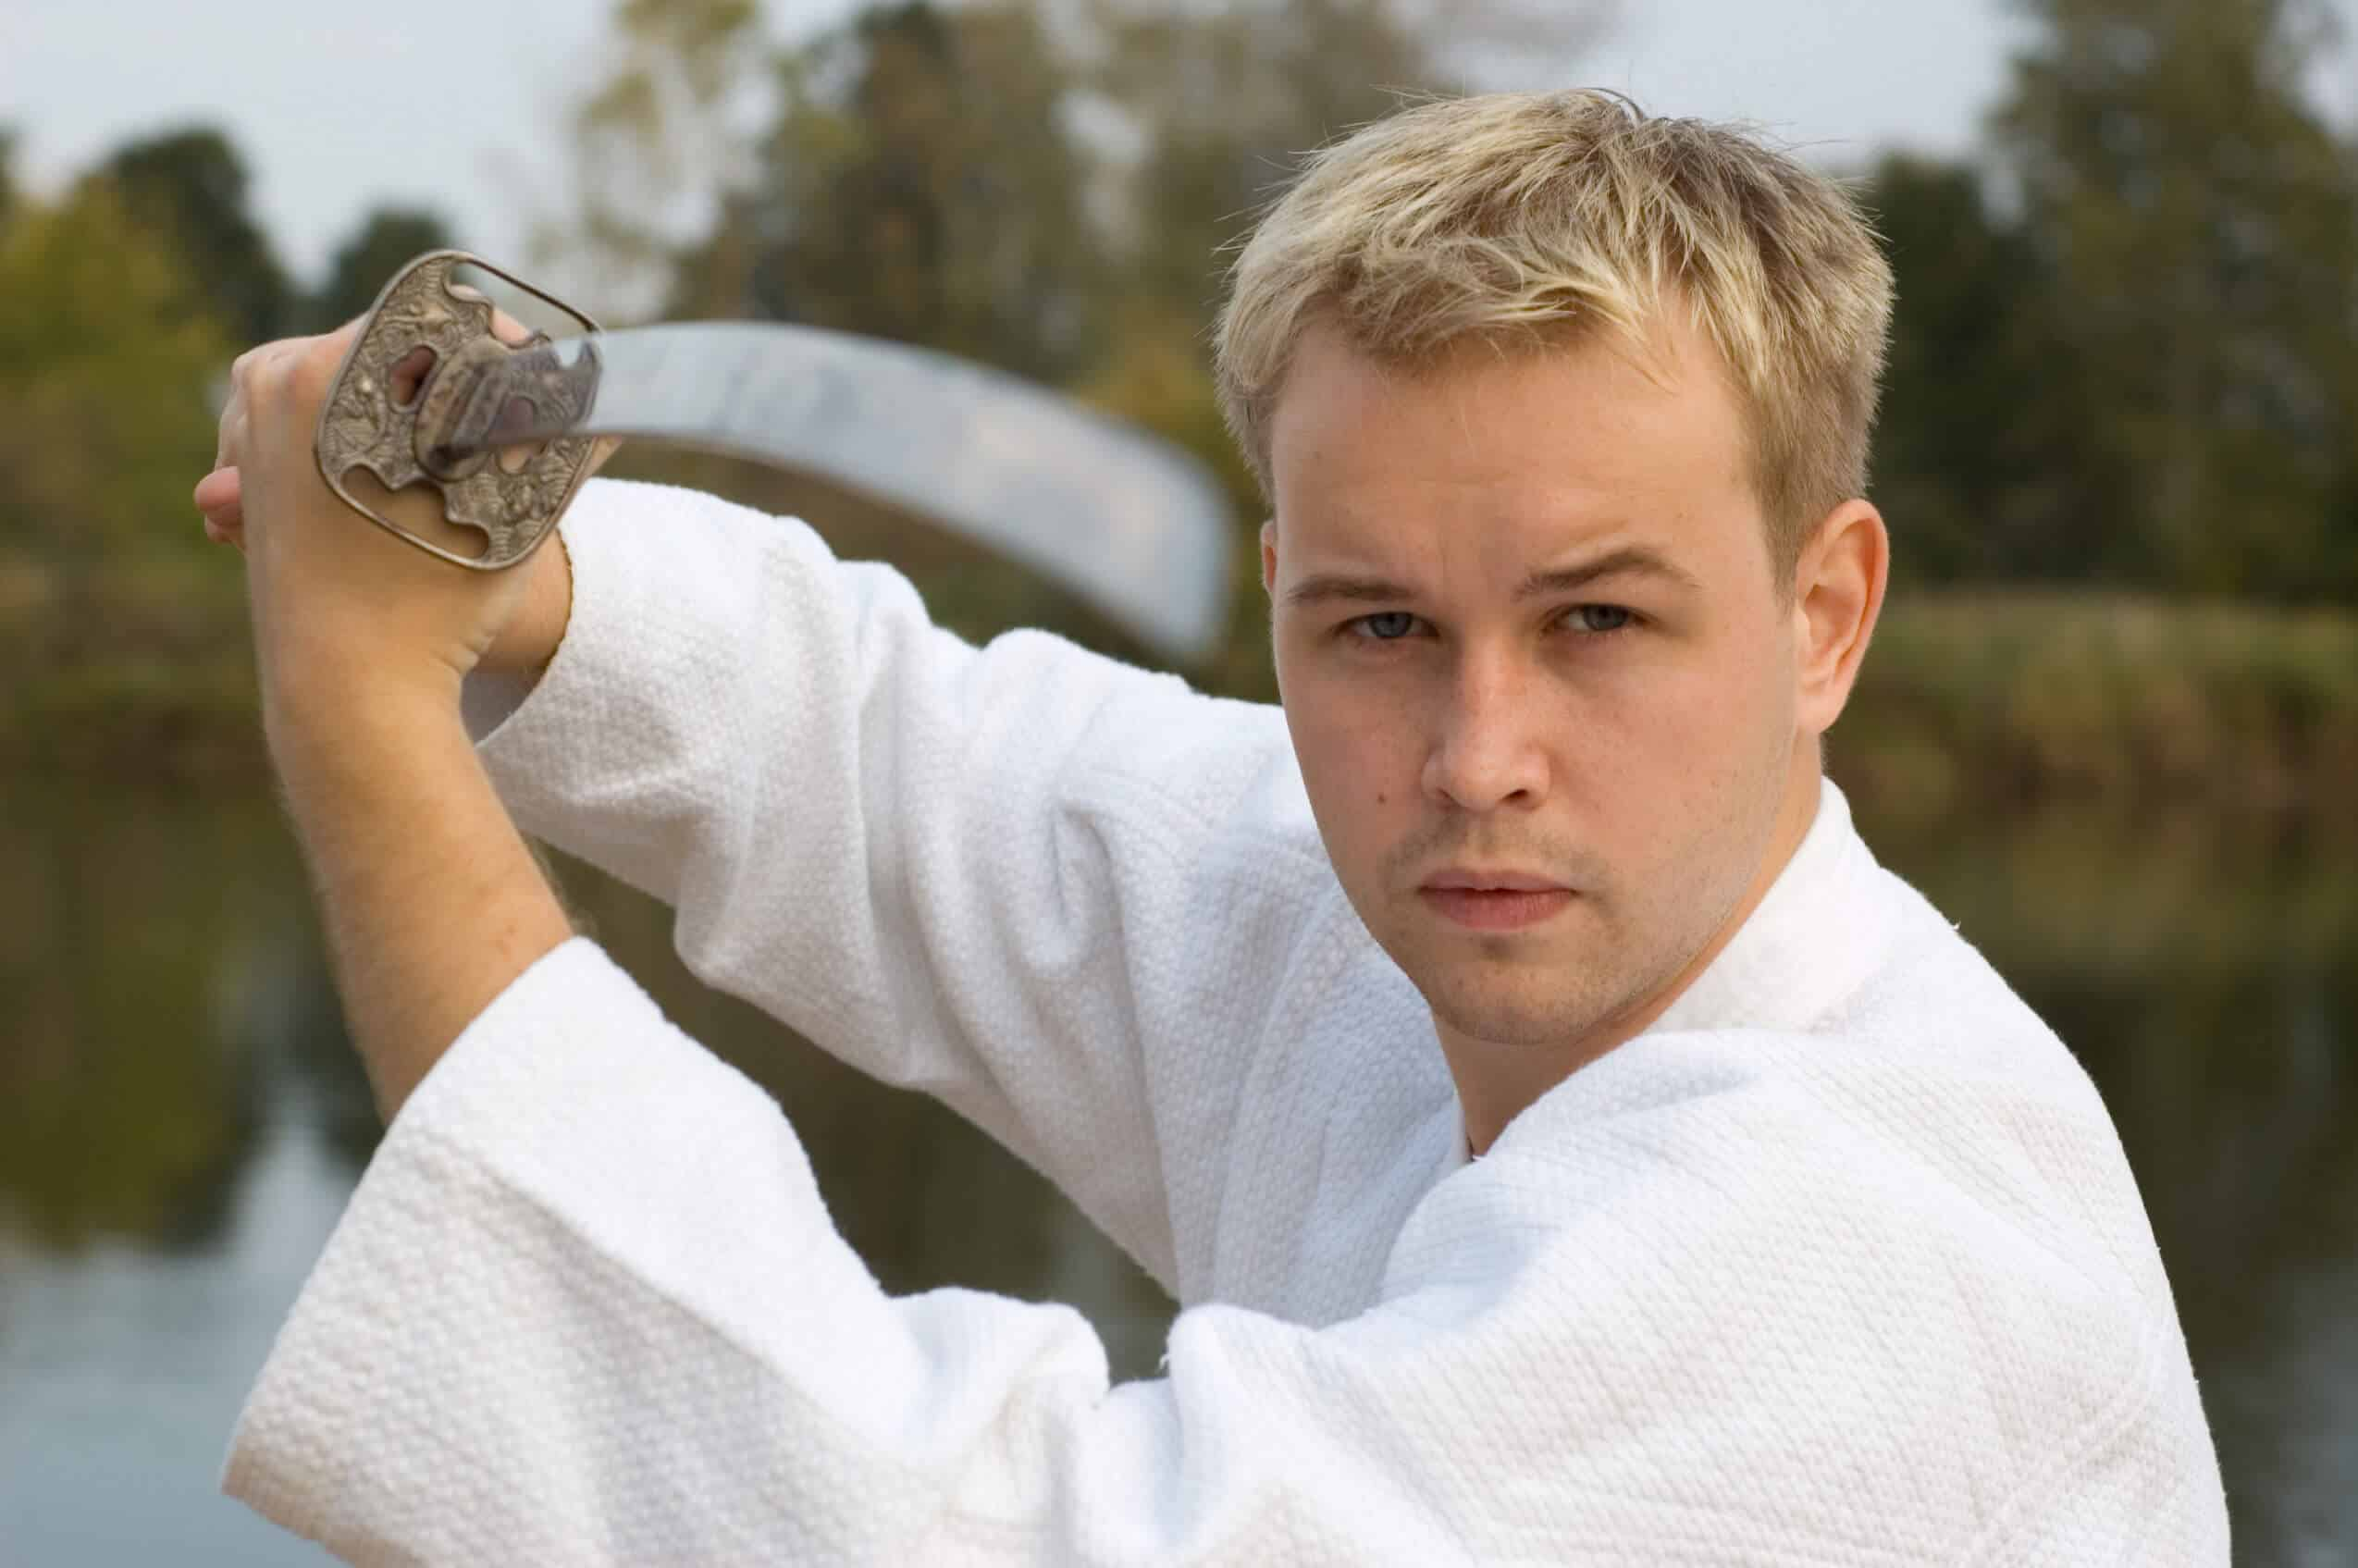 Martial Arts Lessons for Adults in Carrollton TX - Samurai Sword Posing Blog